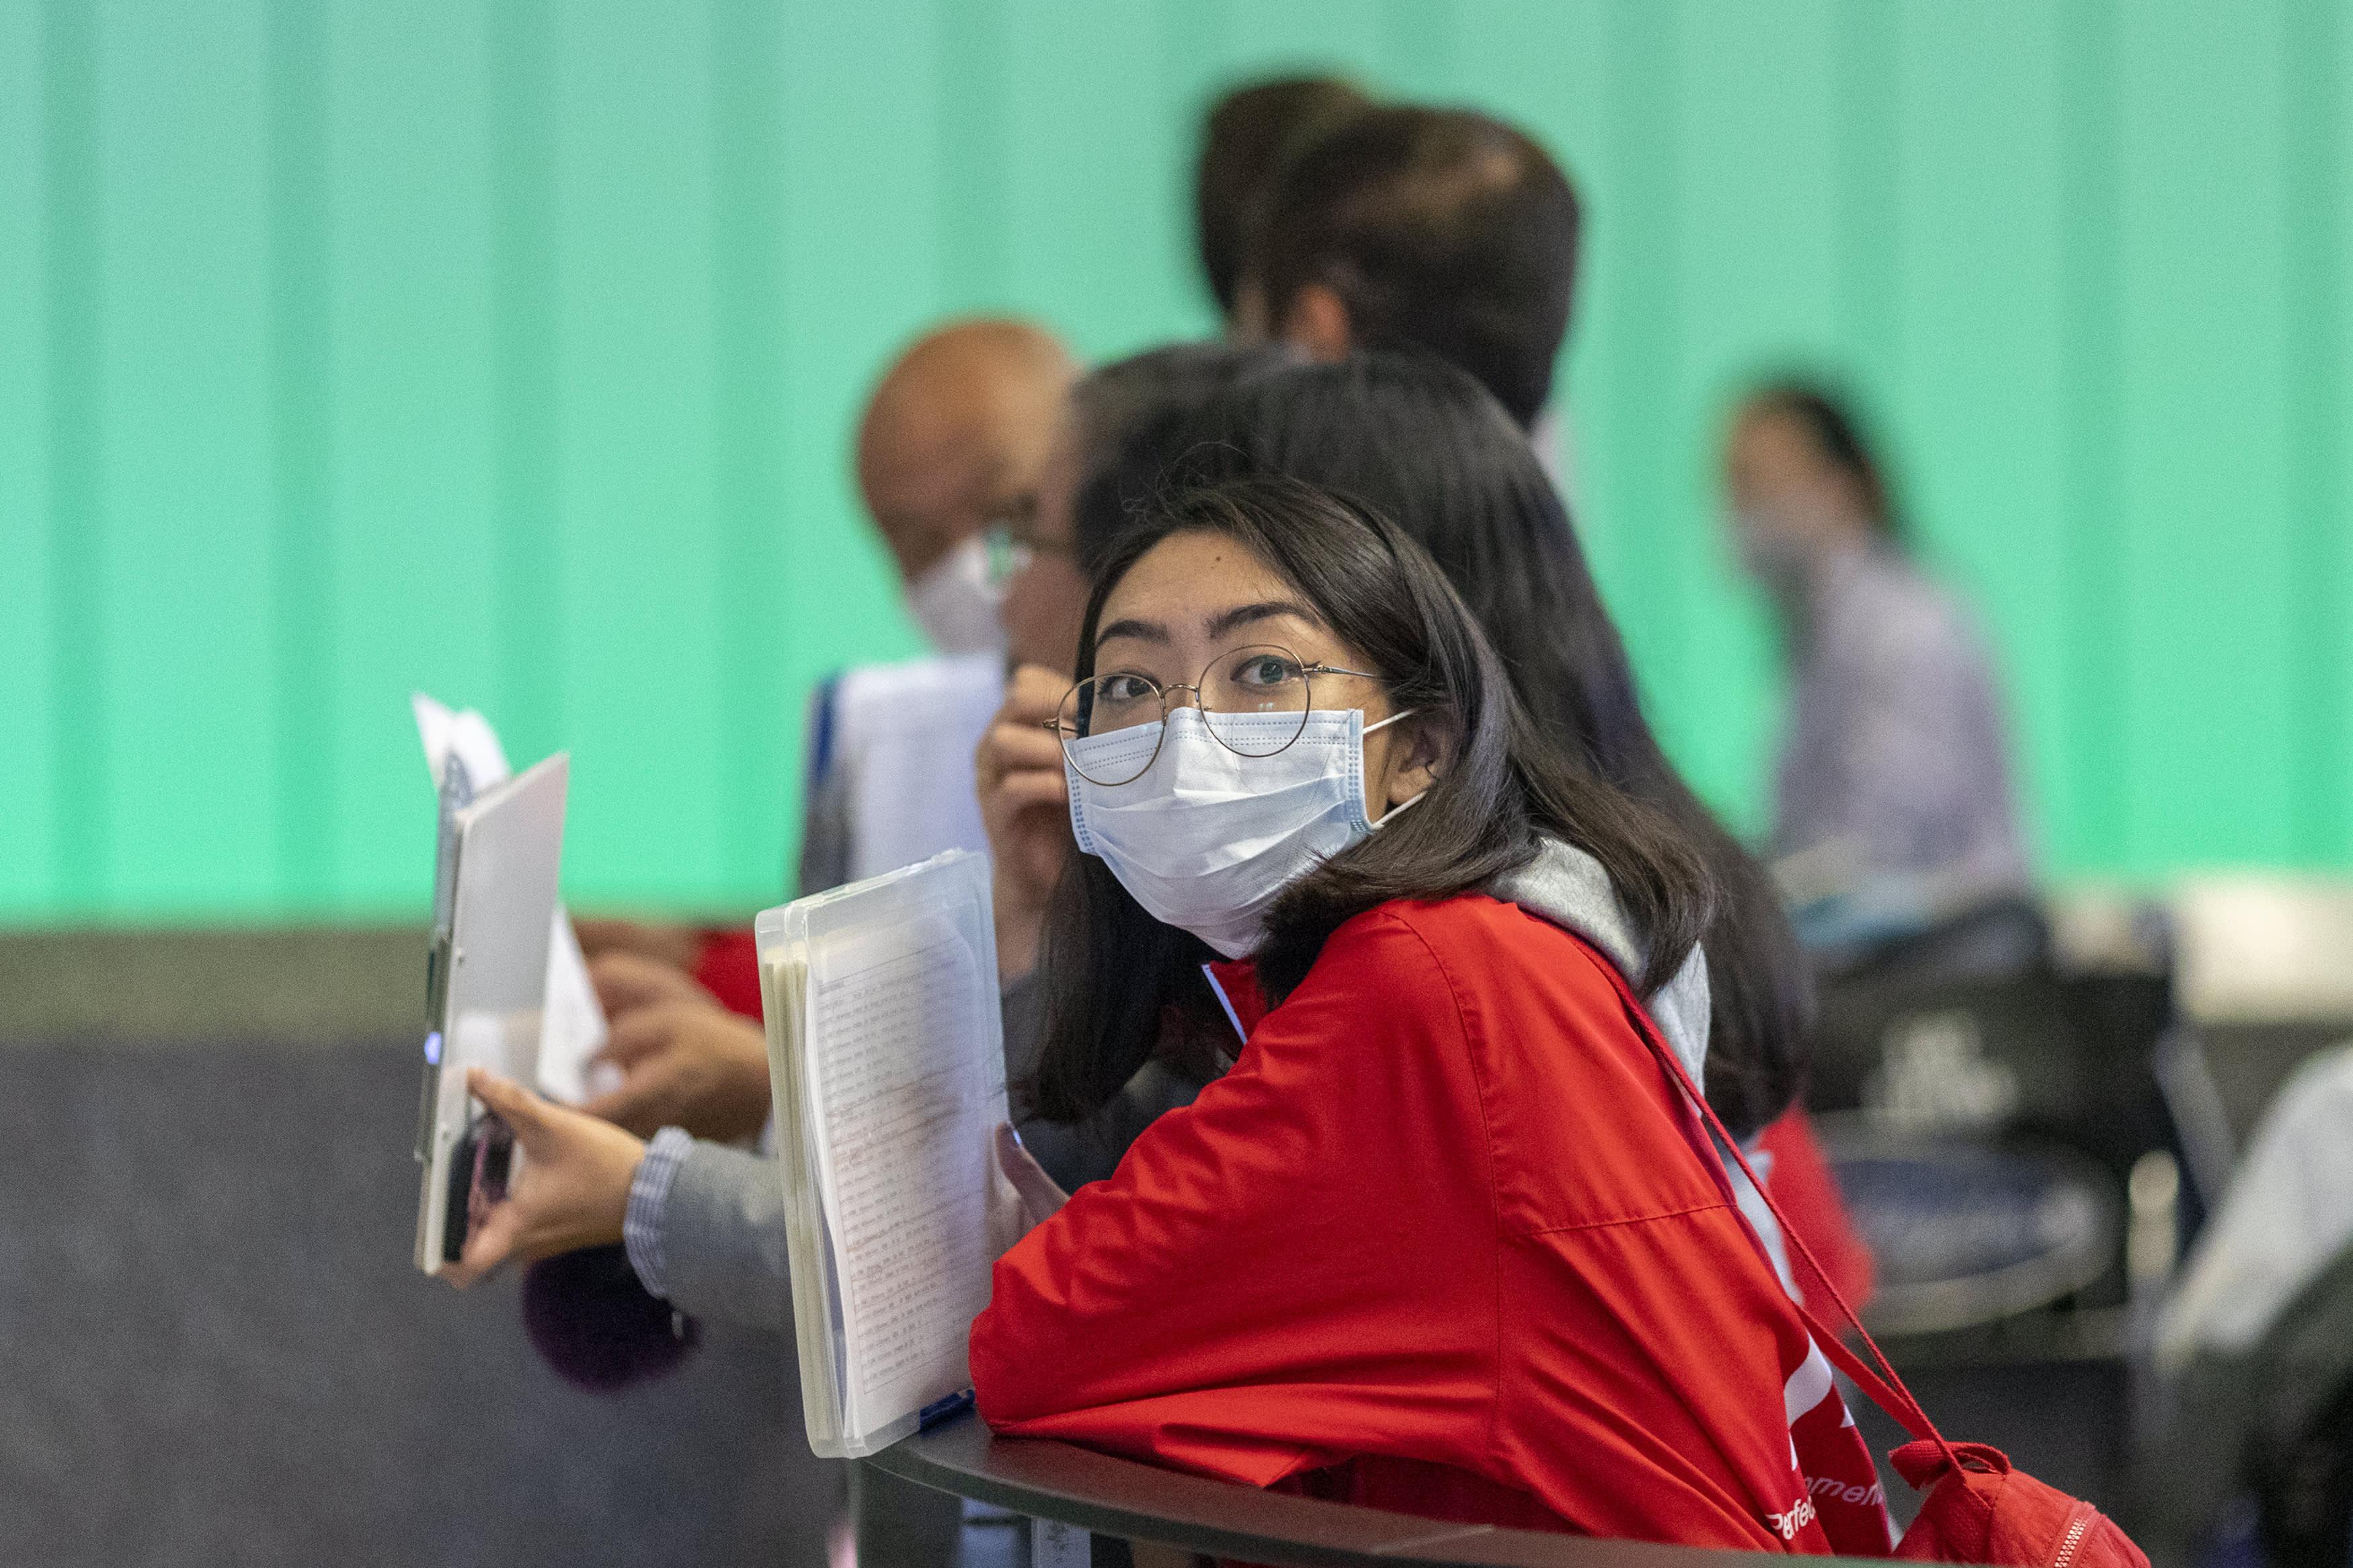 UC San Diego health experts provide updates on coronavirus patients